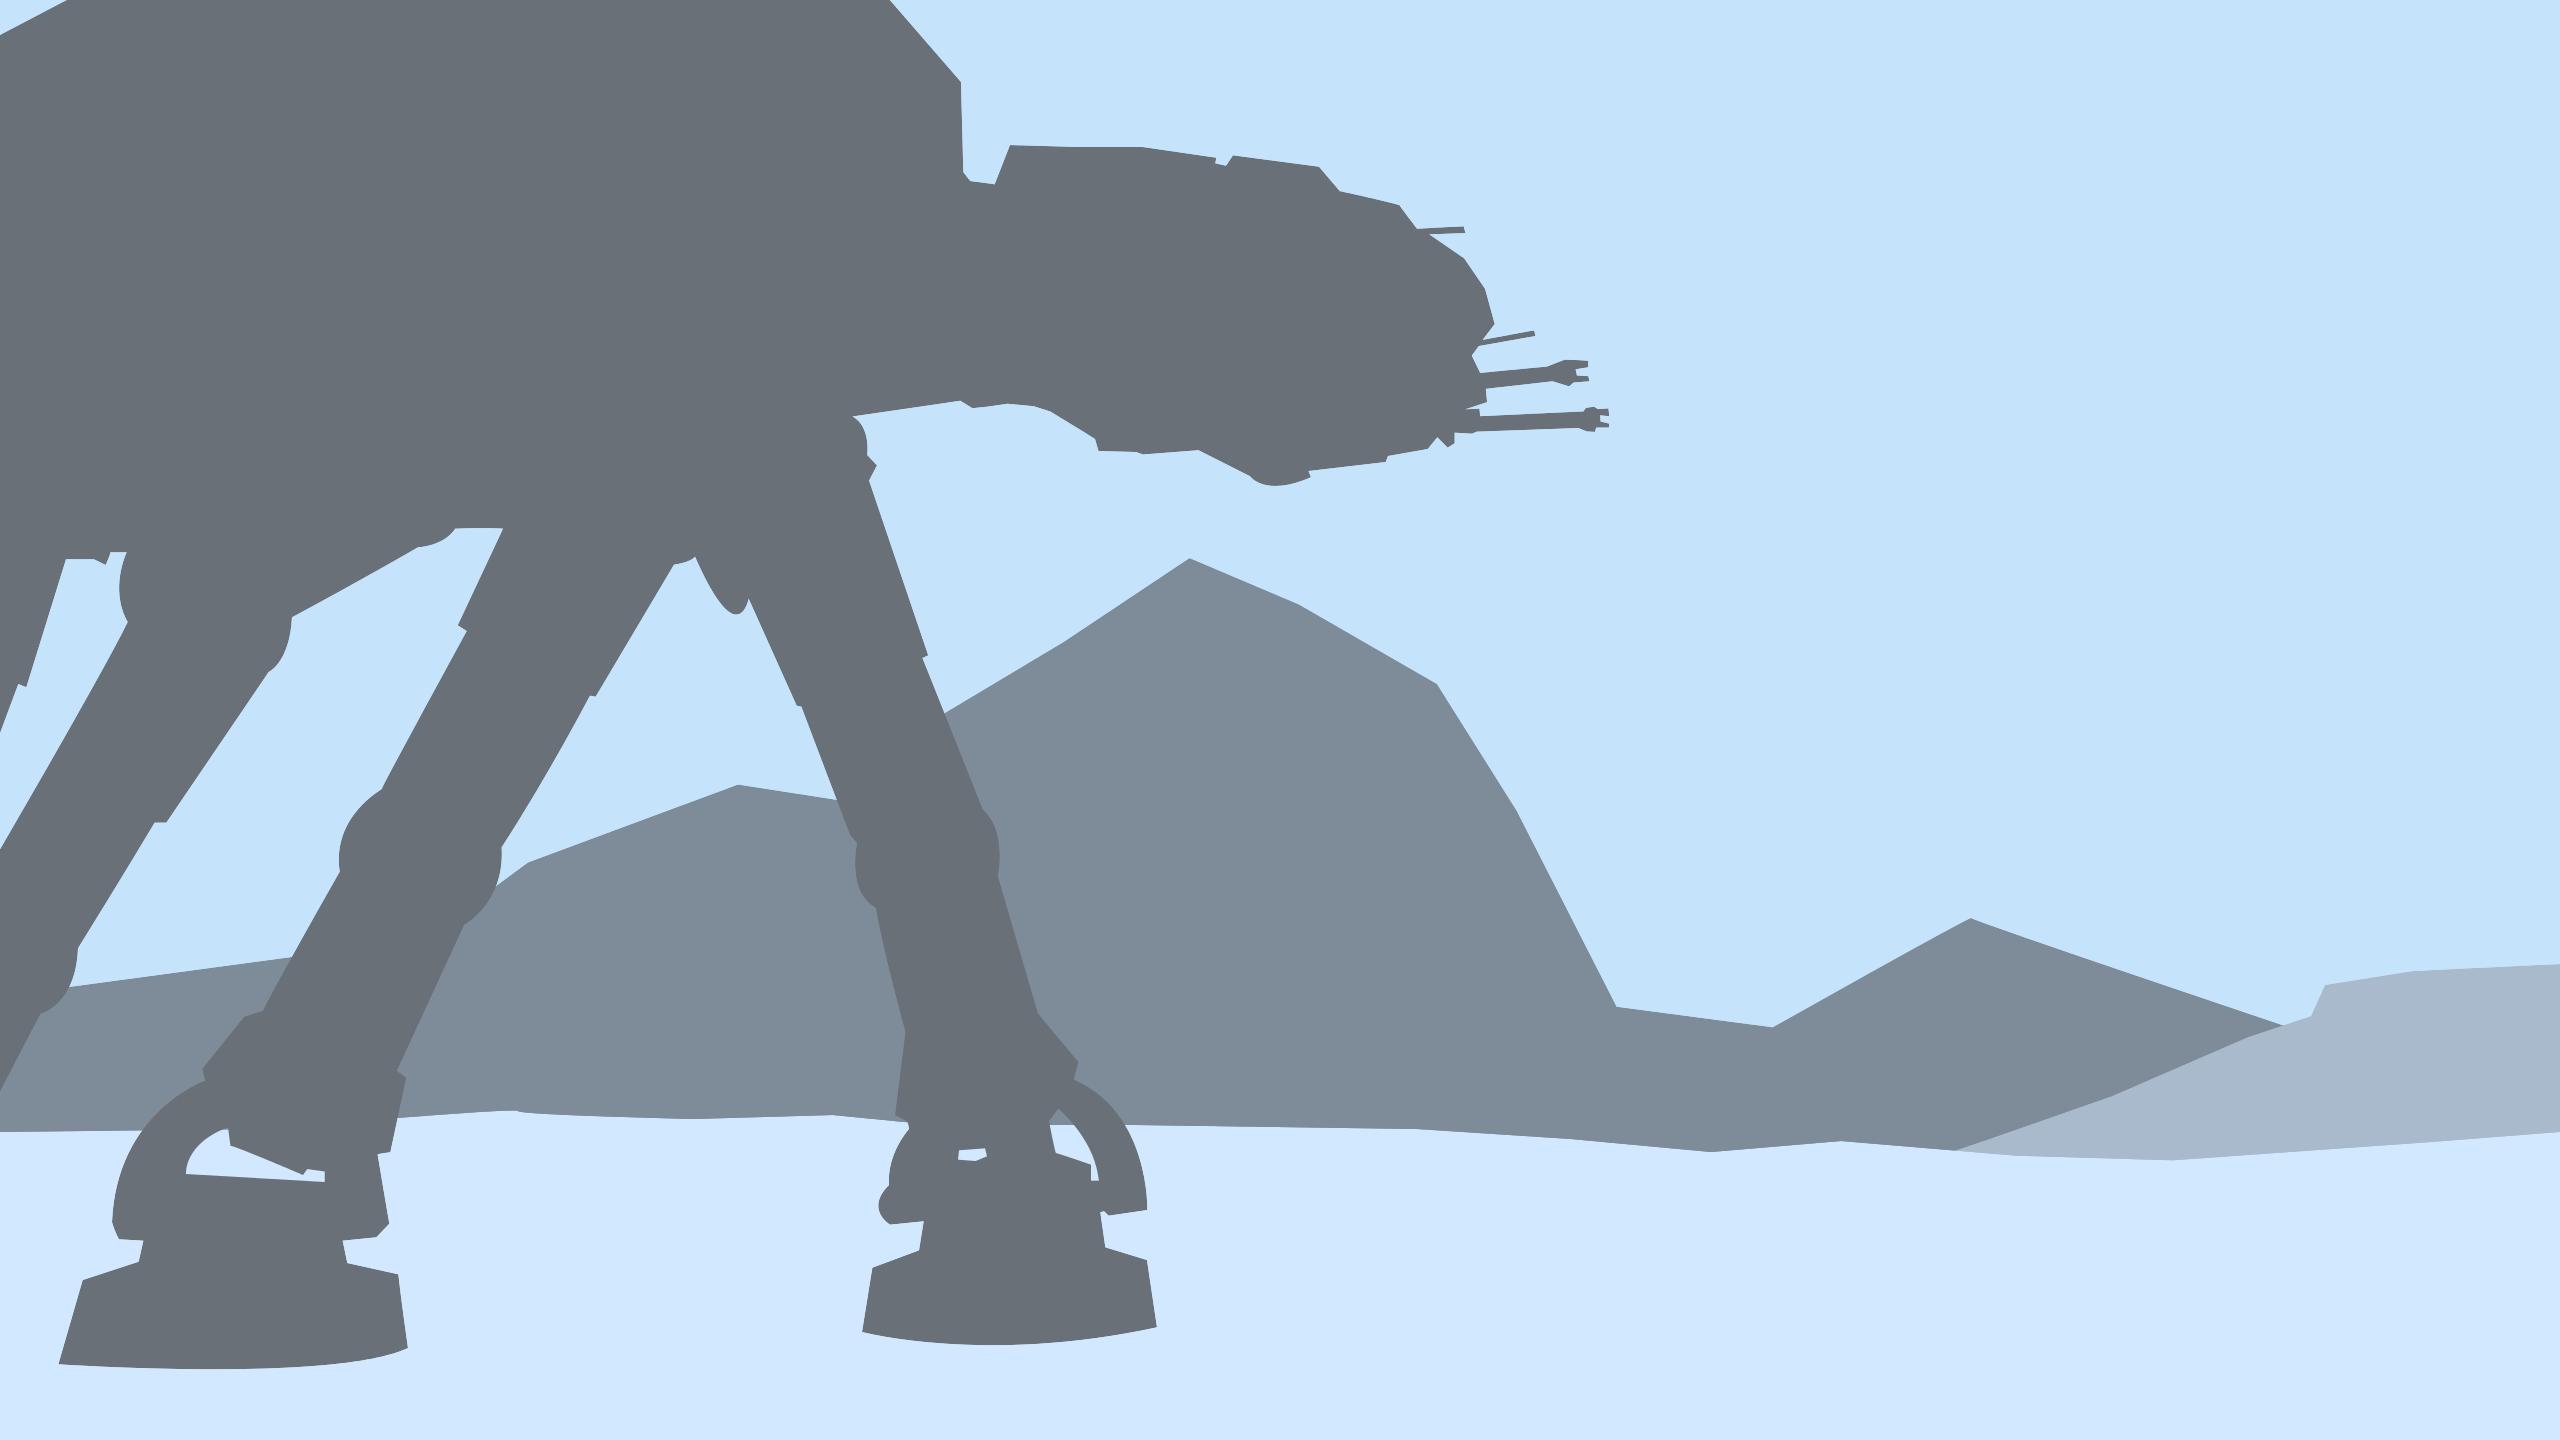 Minimal Battle Of Hoth Wallpaper By Cheetashock On Deviantart